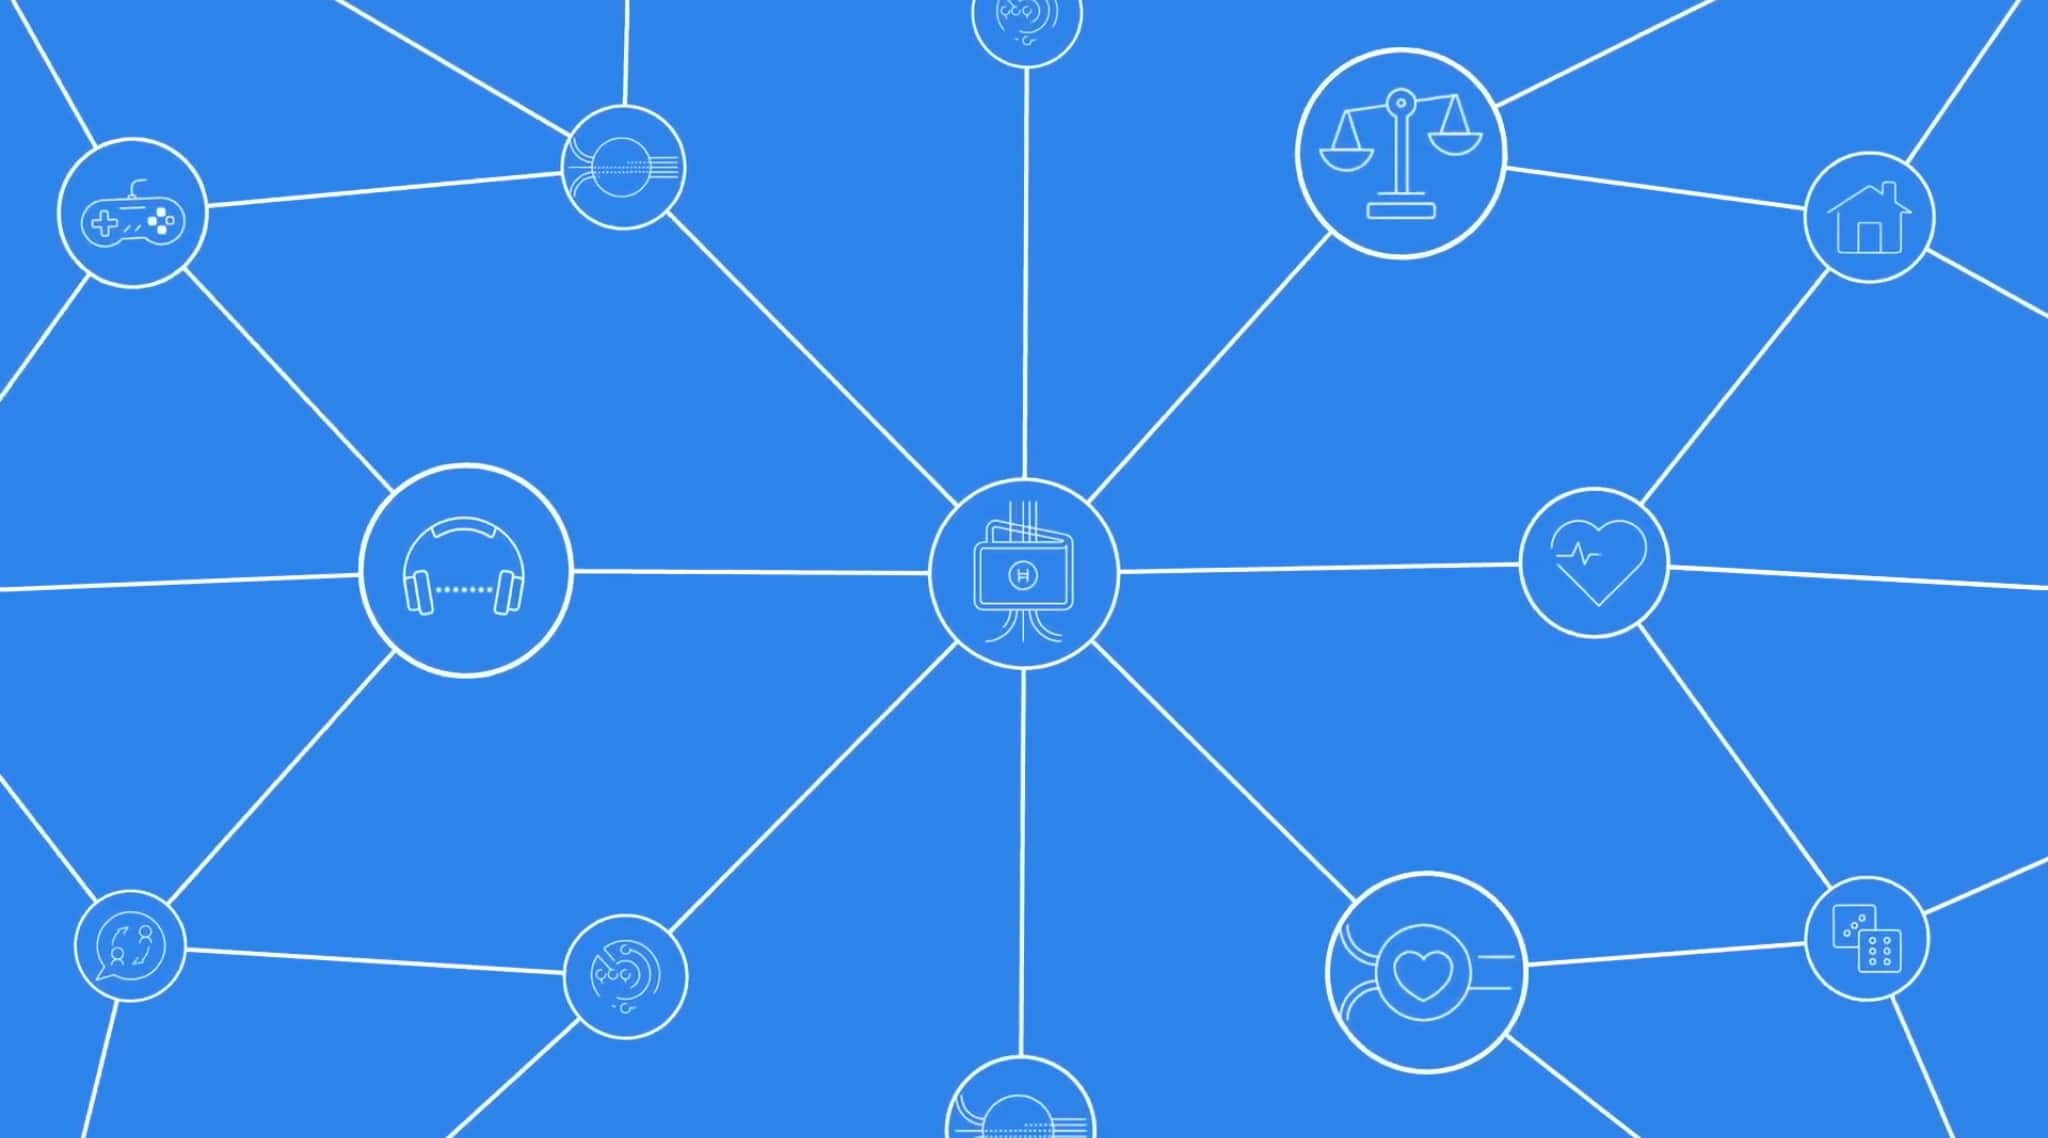 Хедера Хэшграф - новая альтернатива блокчейну